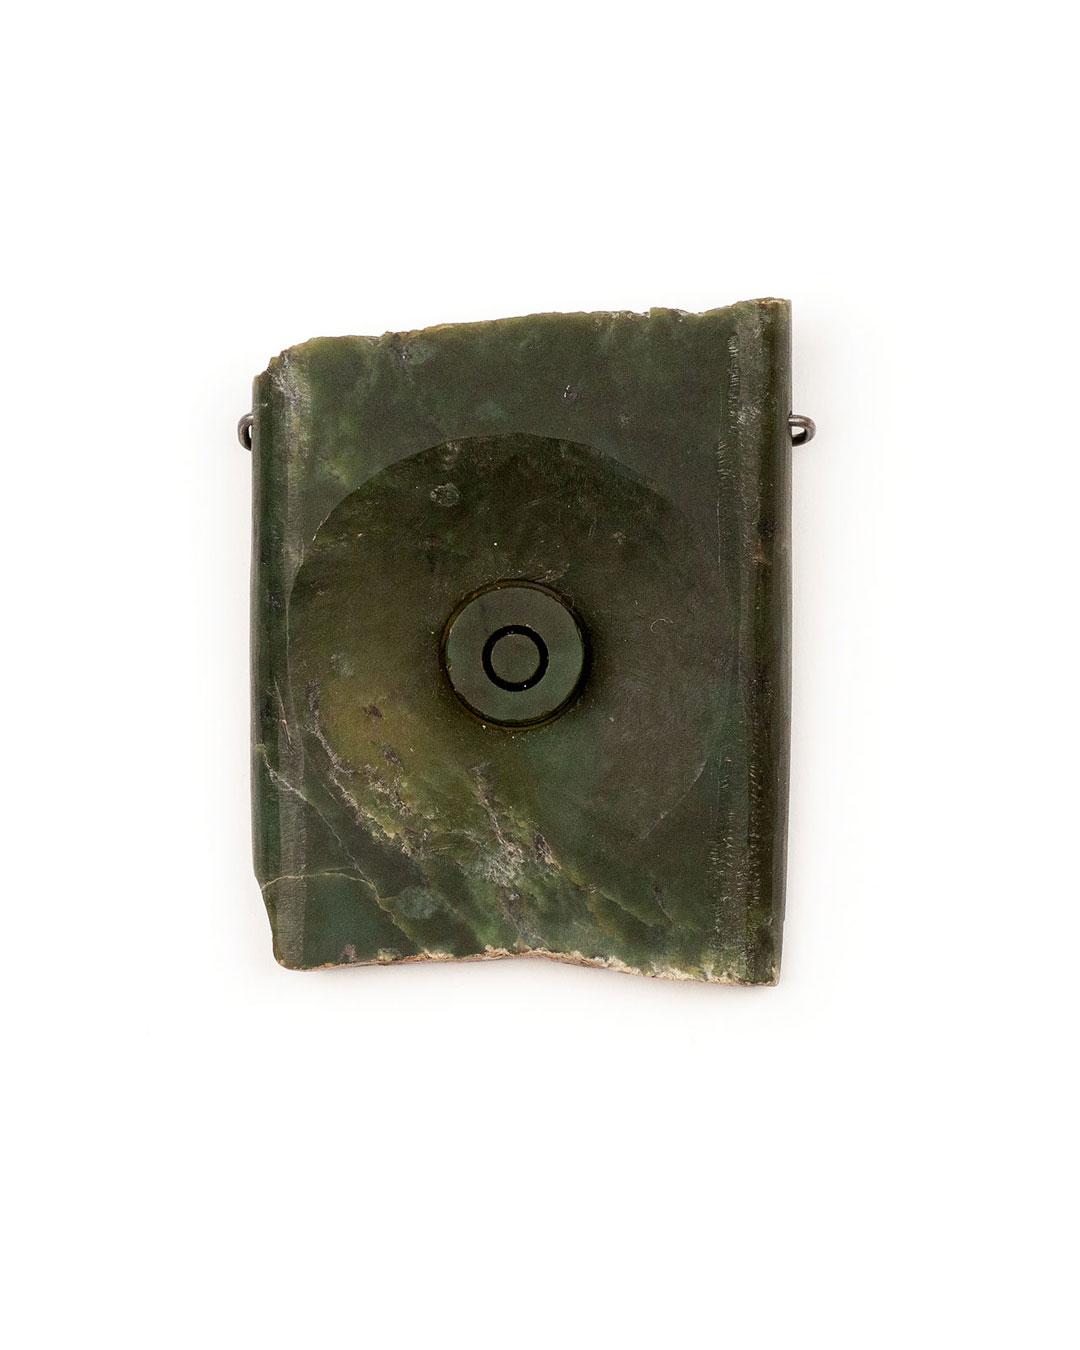 Pavel Opočenský, untitled, 2000, brooch; nefrite, 54 x 68 x 17 mm, €1265